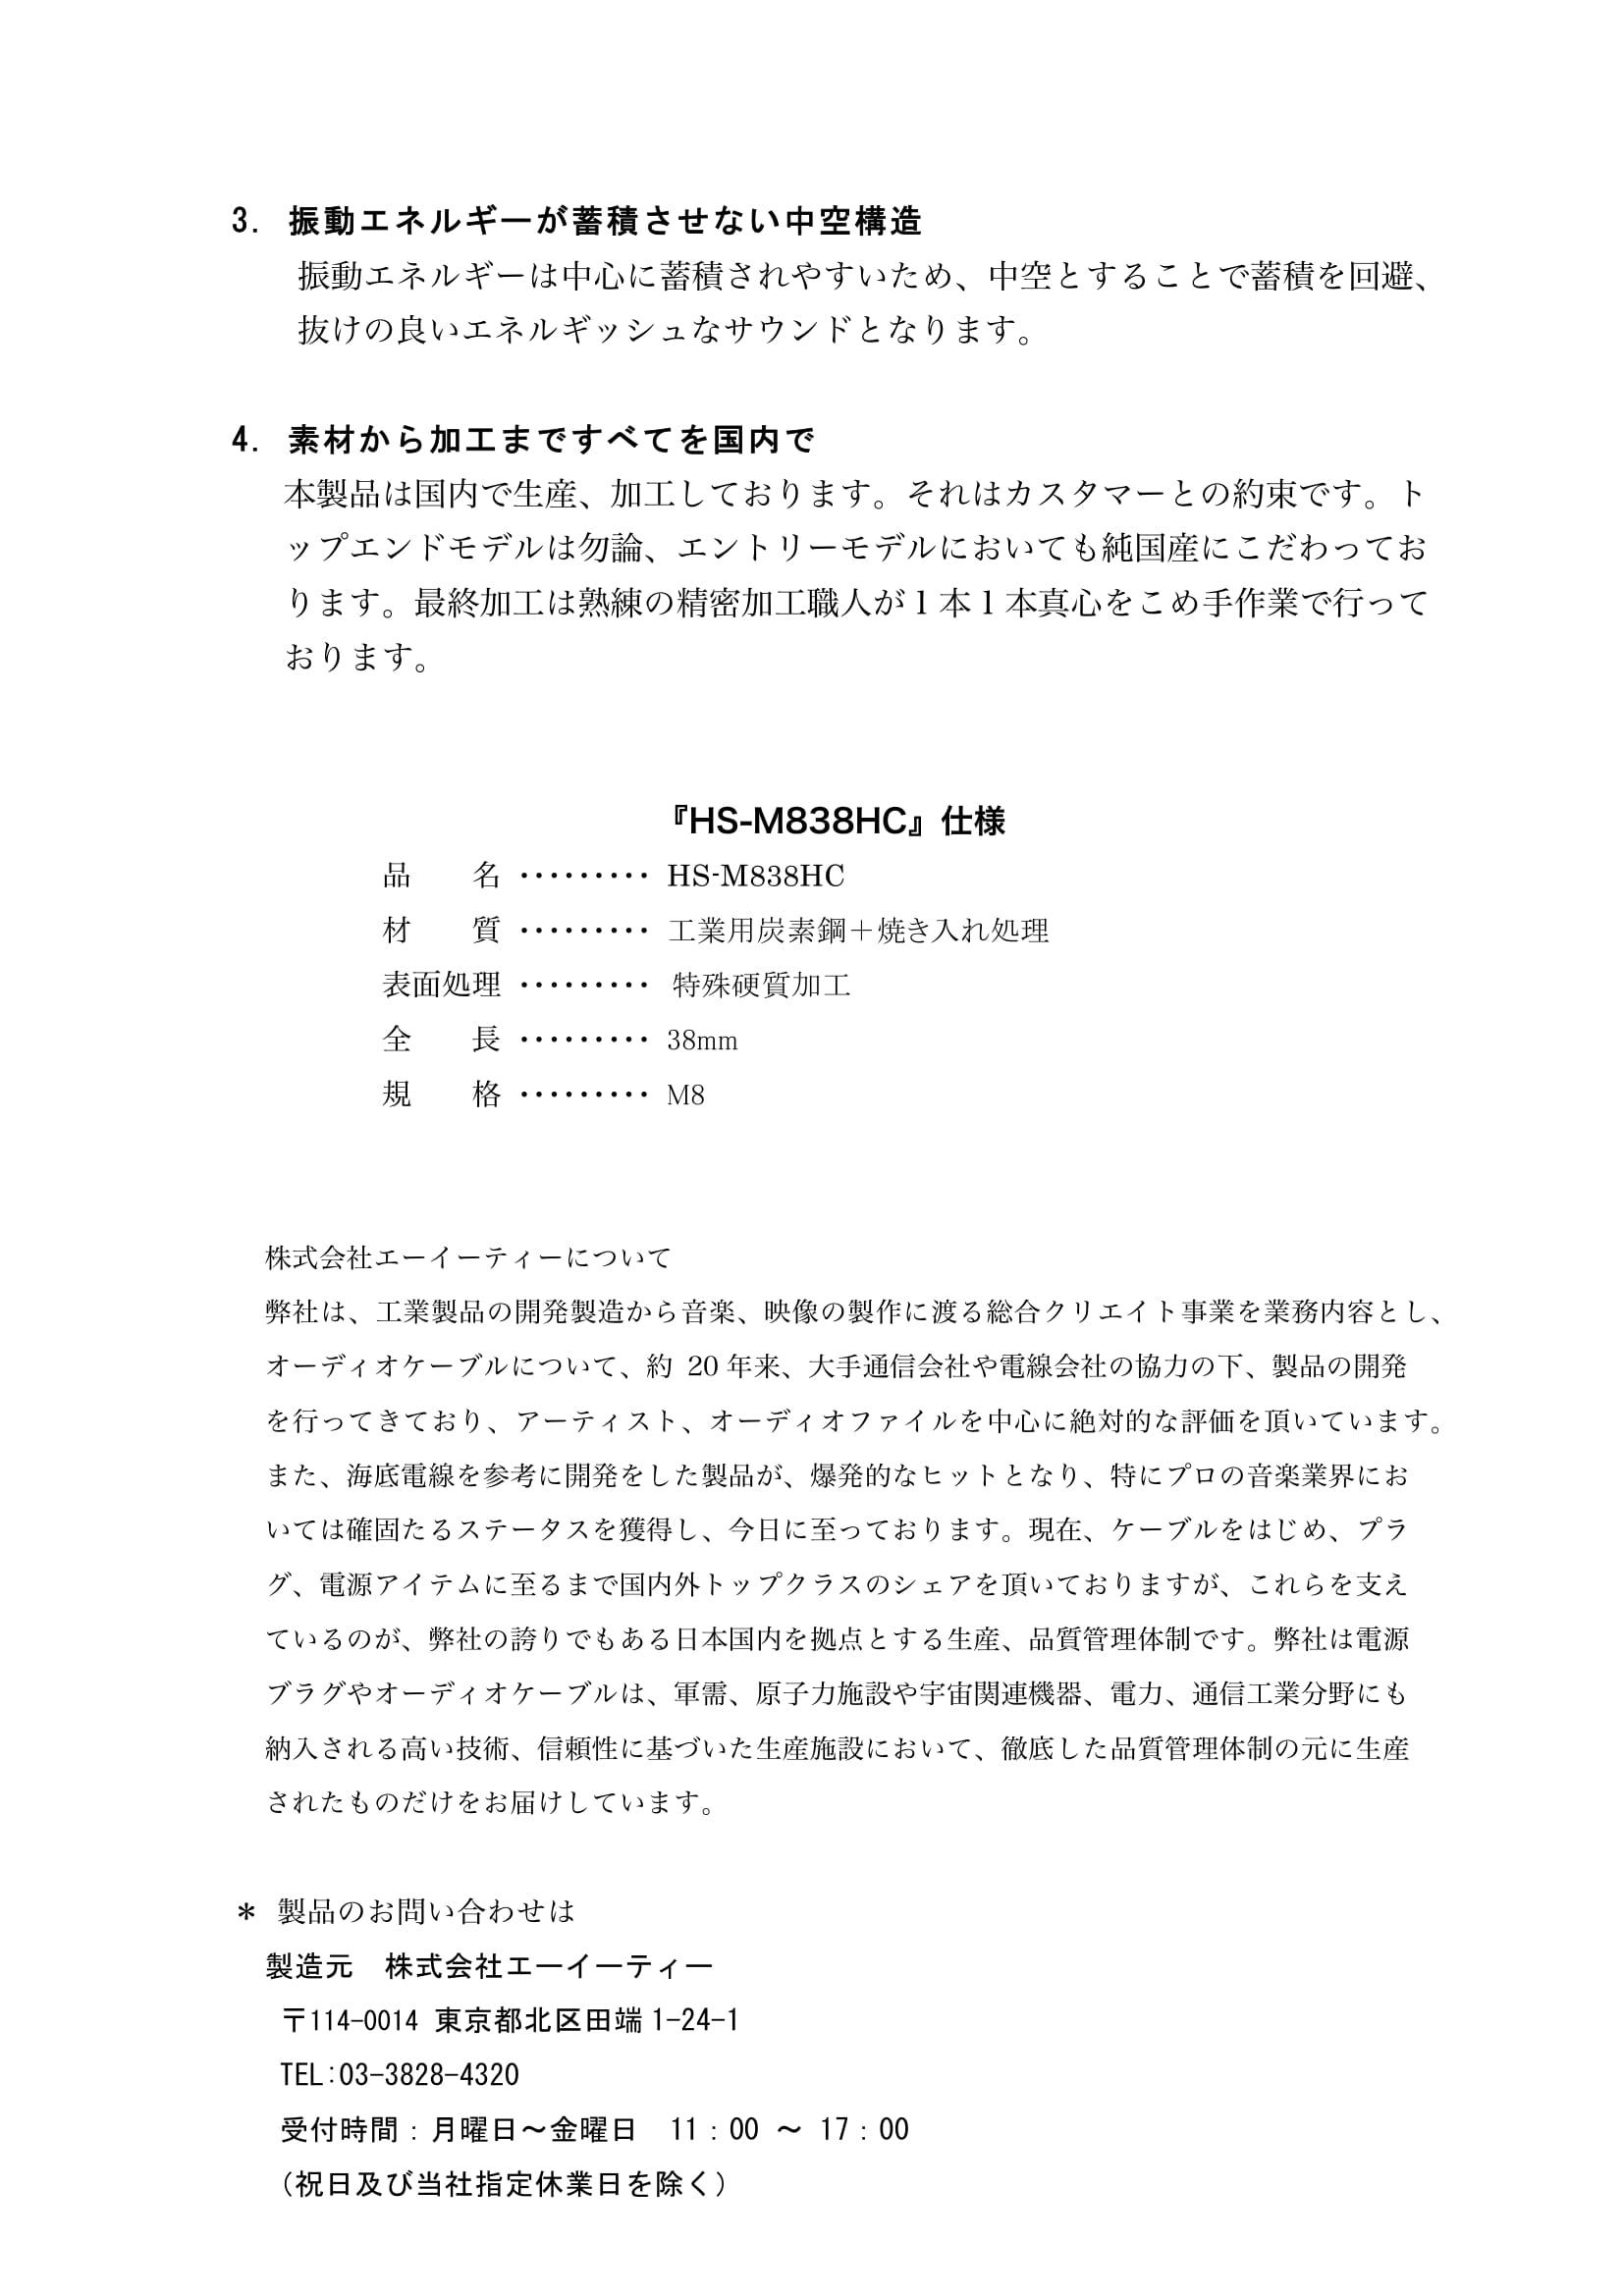 HS-M838HCリリース-3